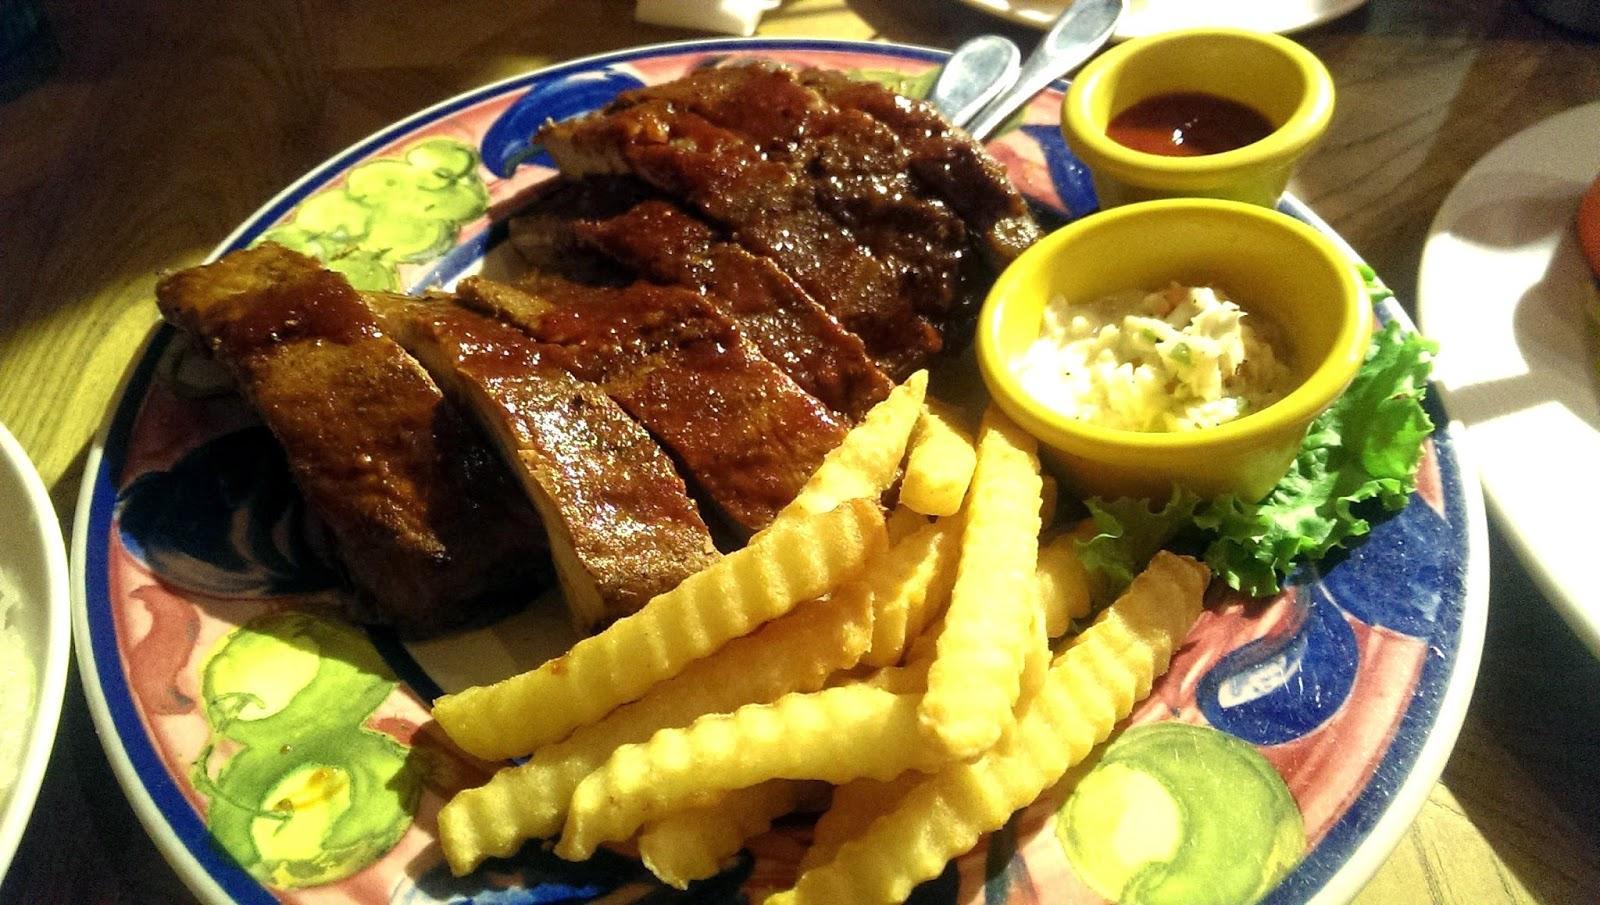 2015 01 24%2B19.06.25 - [食記] Smokey Joe's 冒煙的喬 高雄左營的美式墨西哥餐廳!